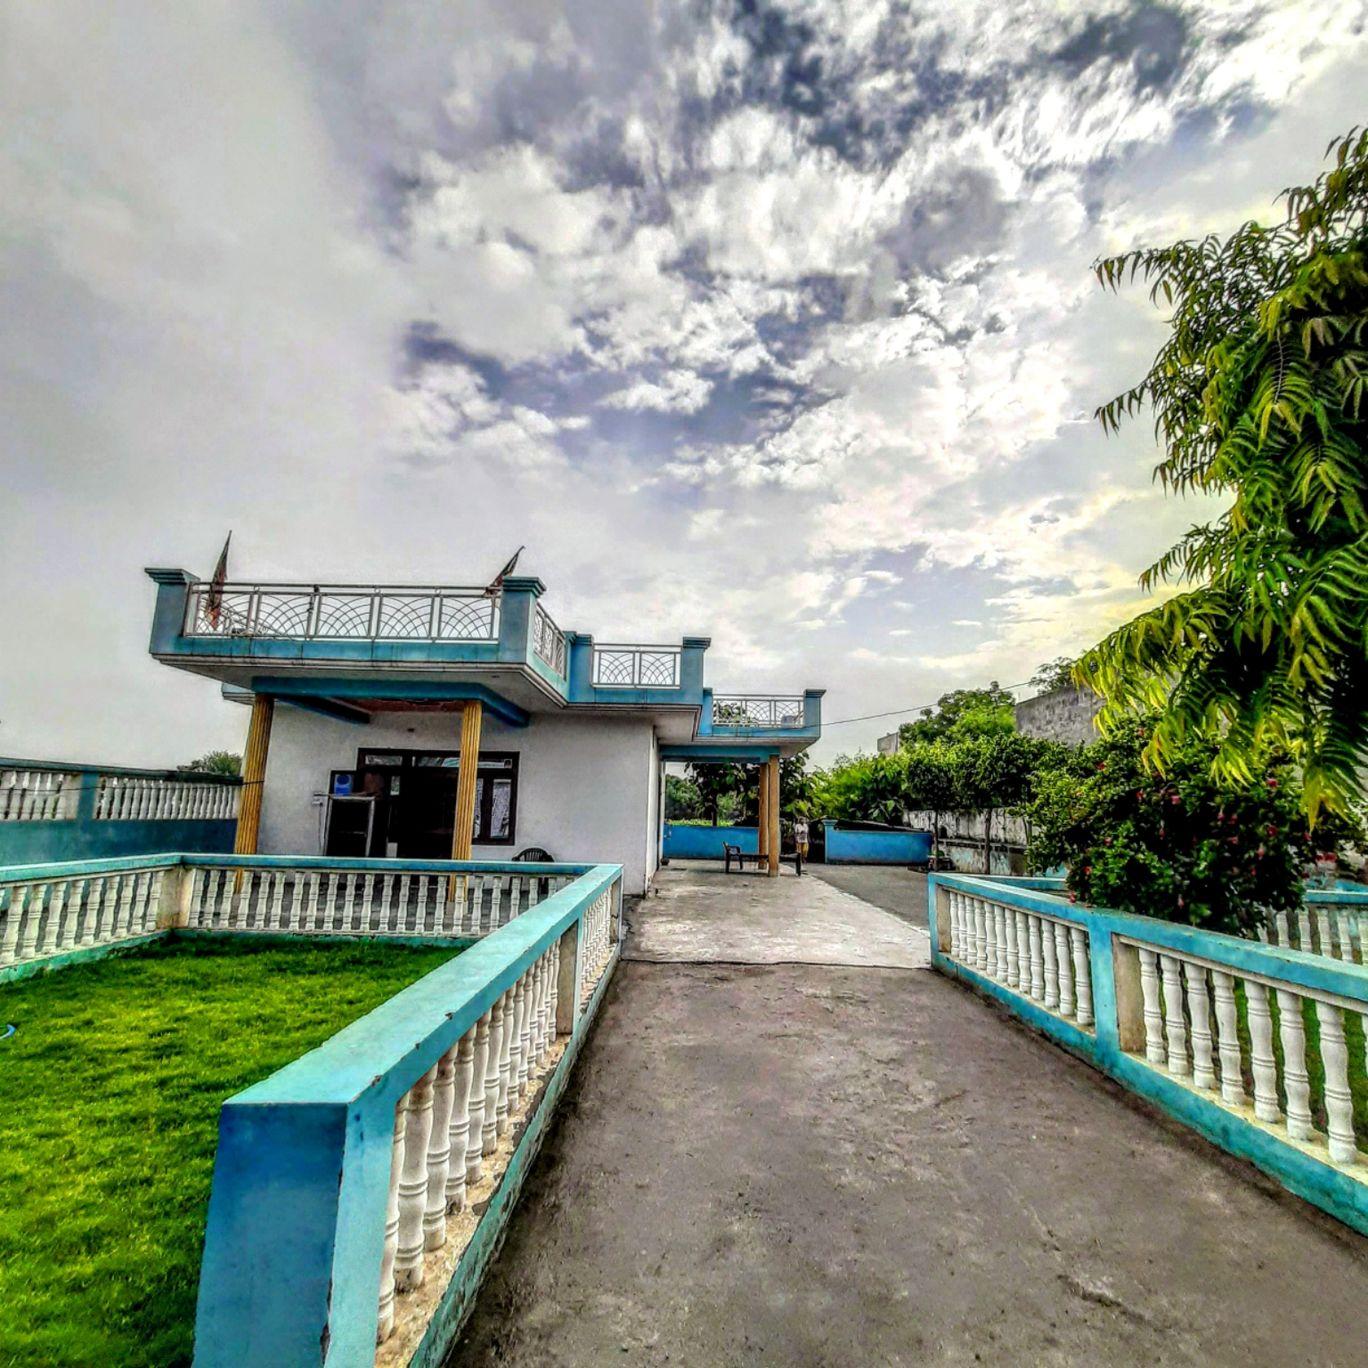 Photo of Greater Noida By Mourish Gurjar